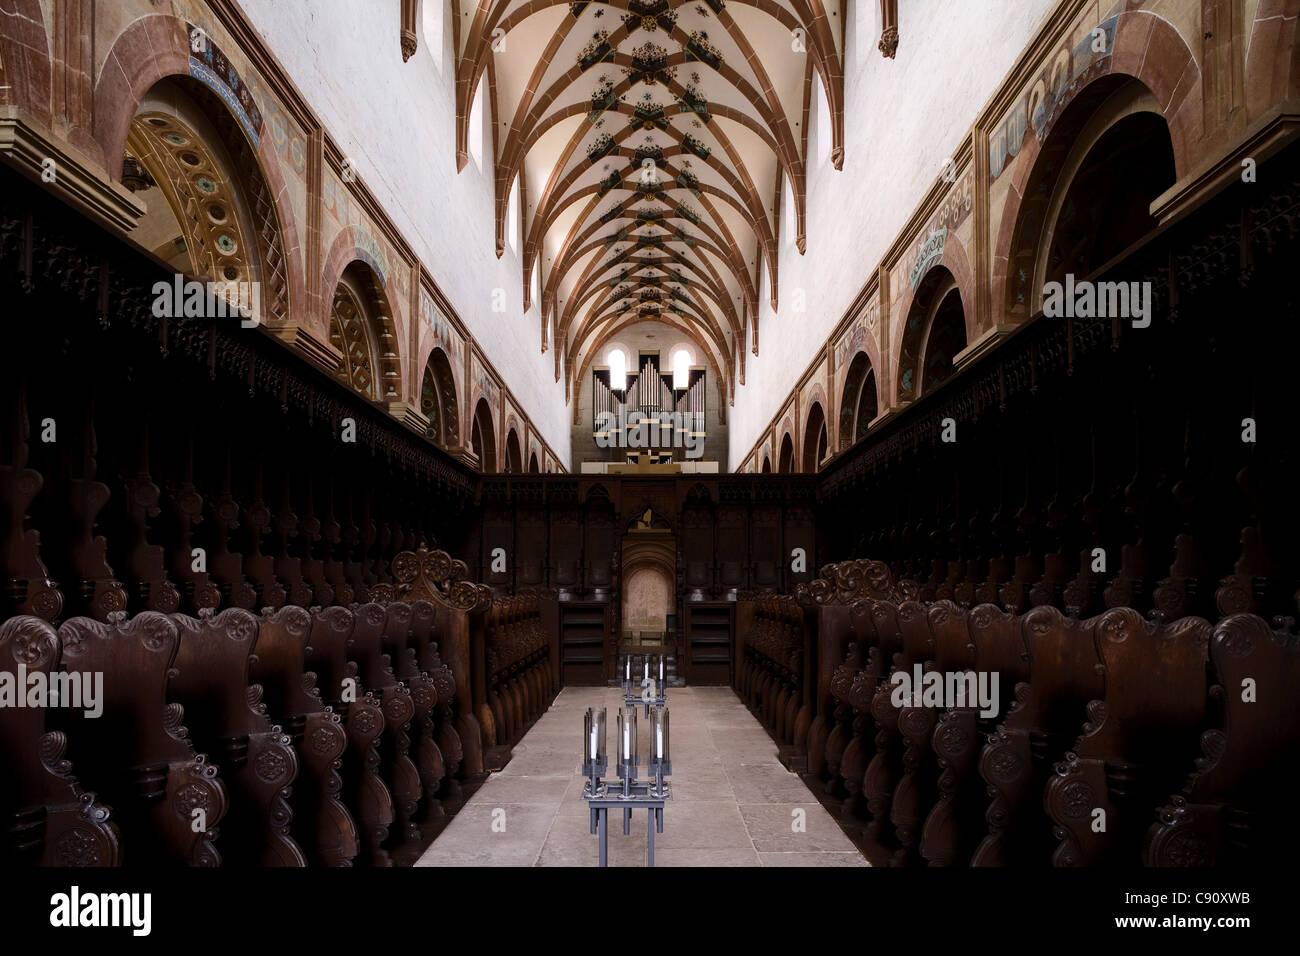 Gothic choir stalls at Maulbronn monastery, Cistercian monastery, Baden-Wuerttemberg, Germany, Europe Stock Photo